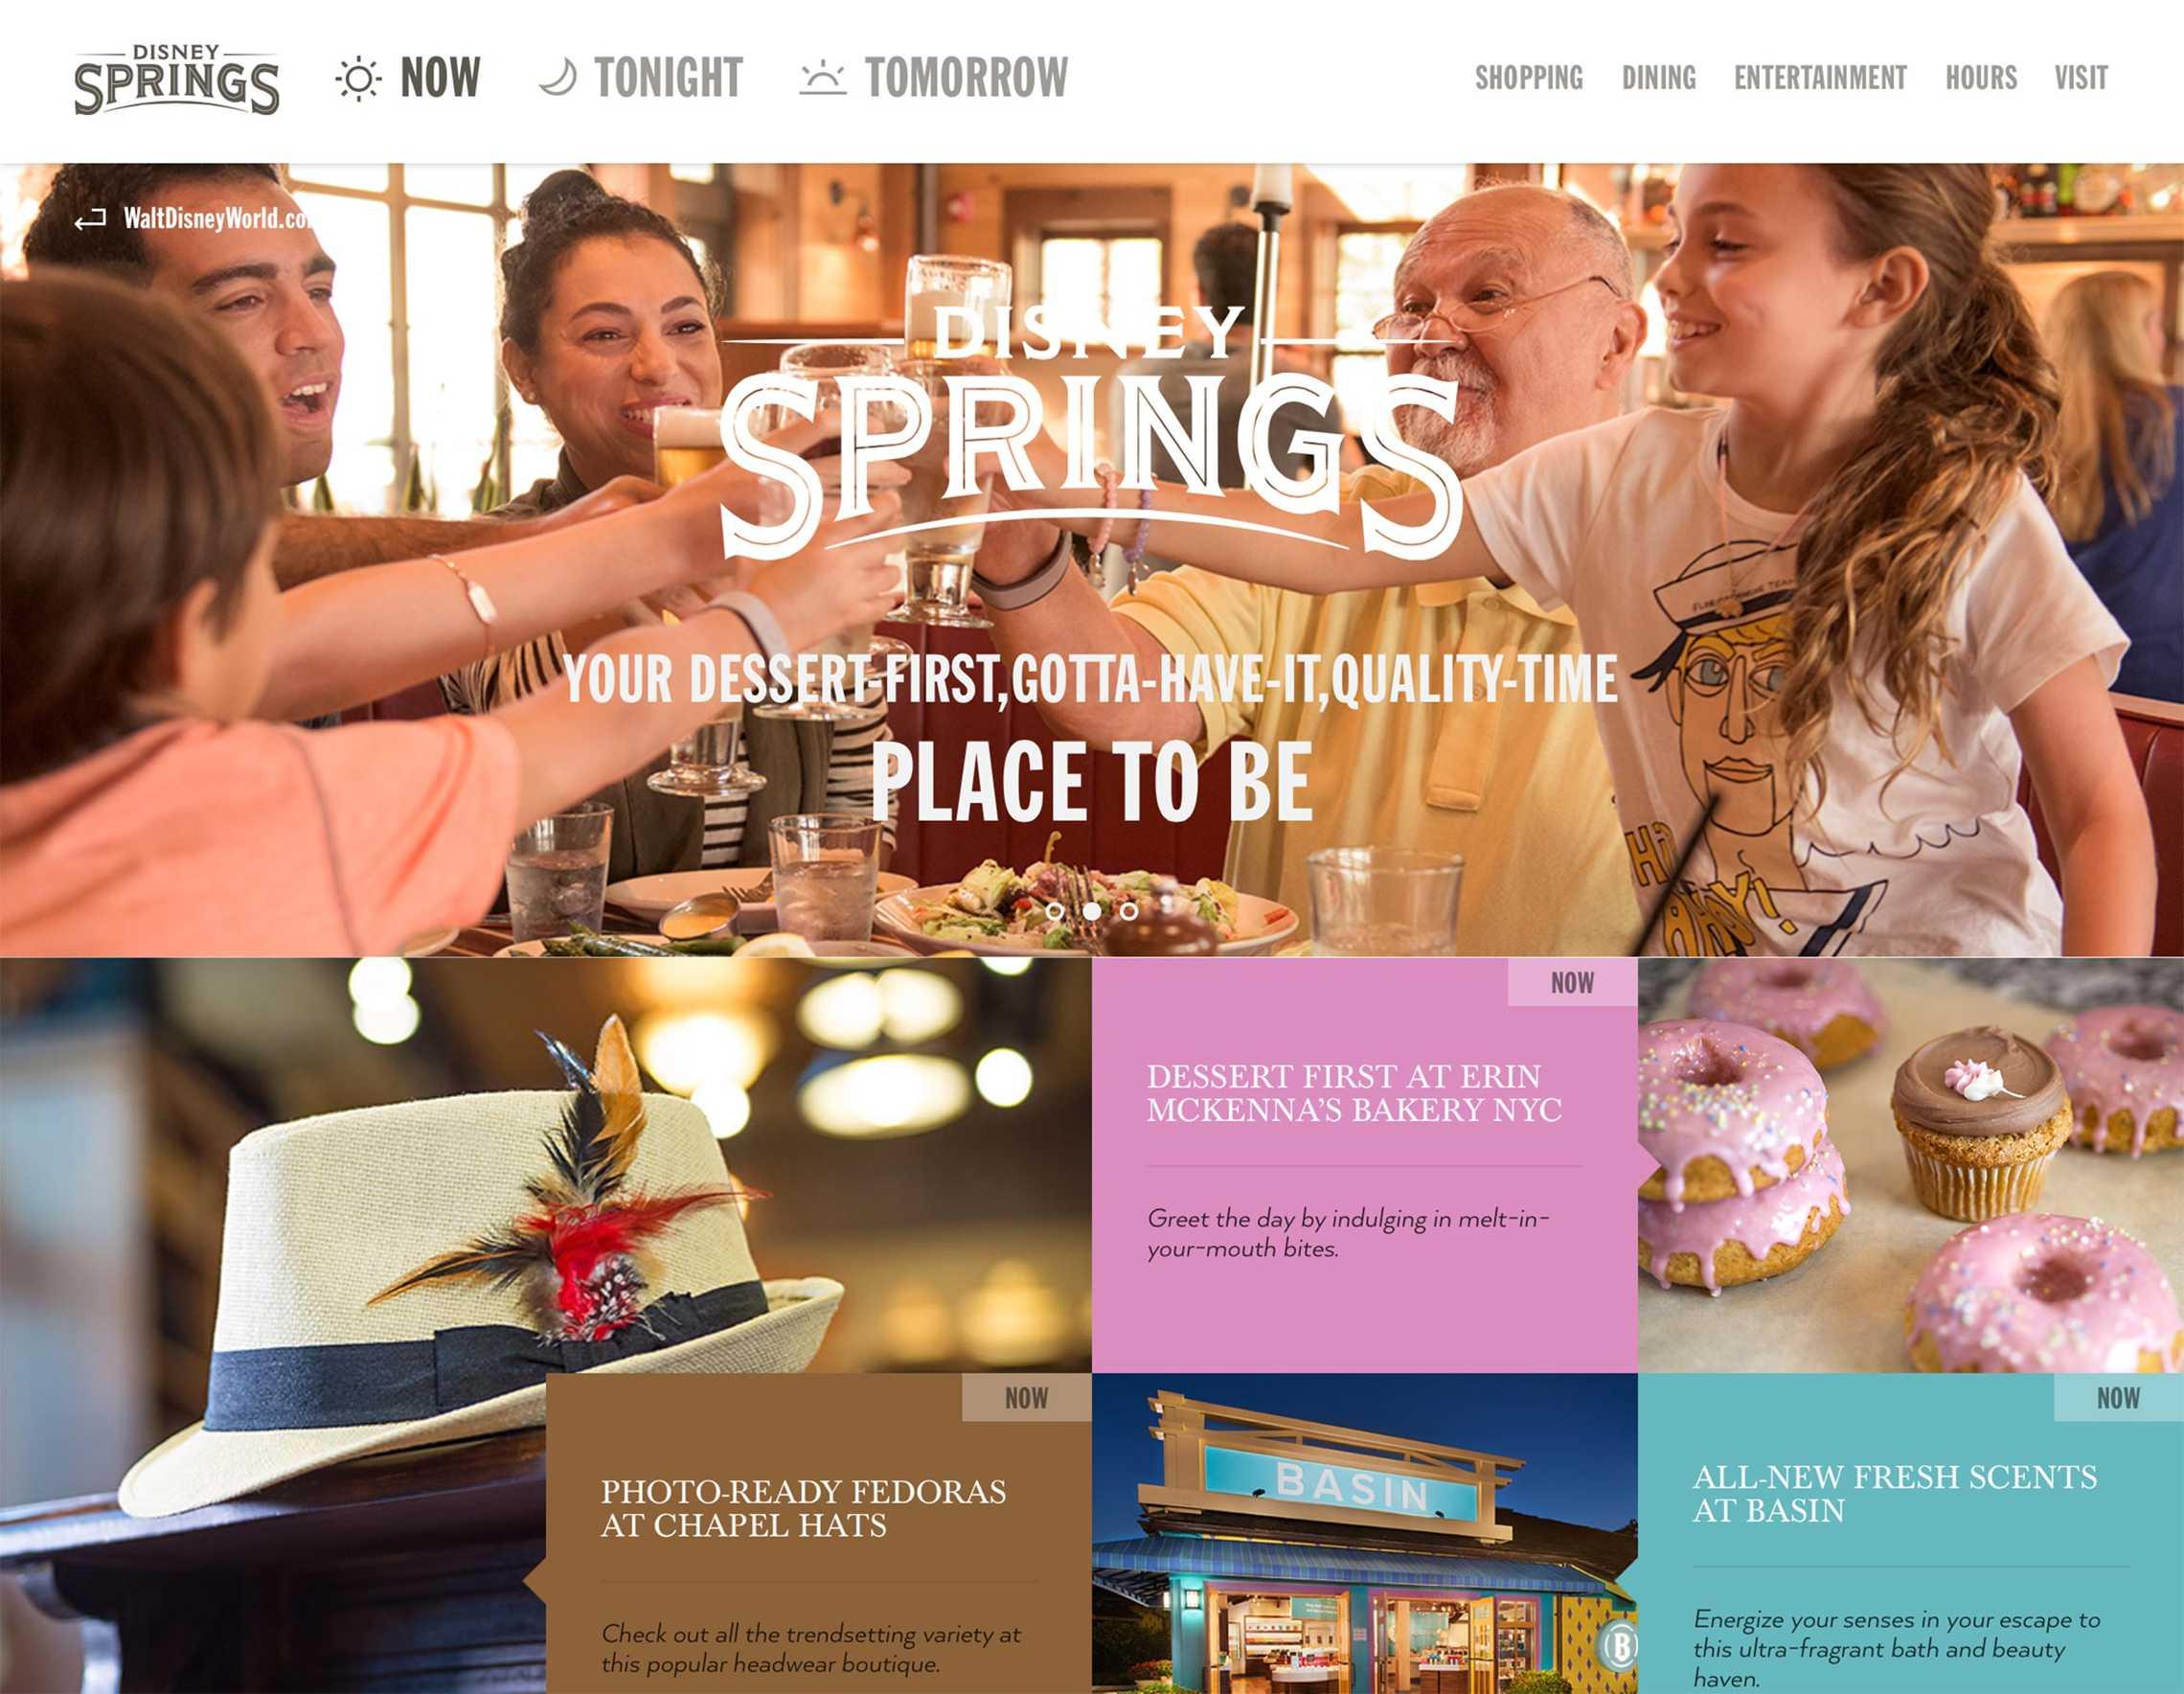 Disney Springs official website screenshot